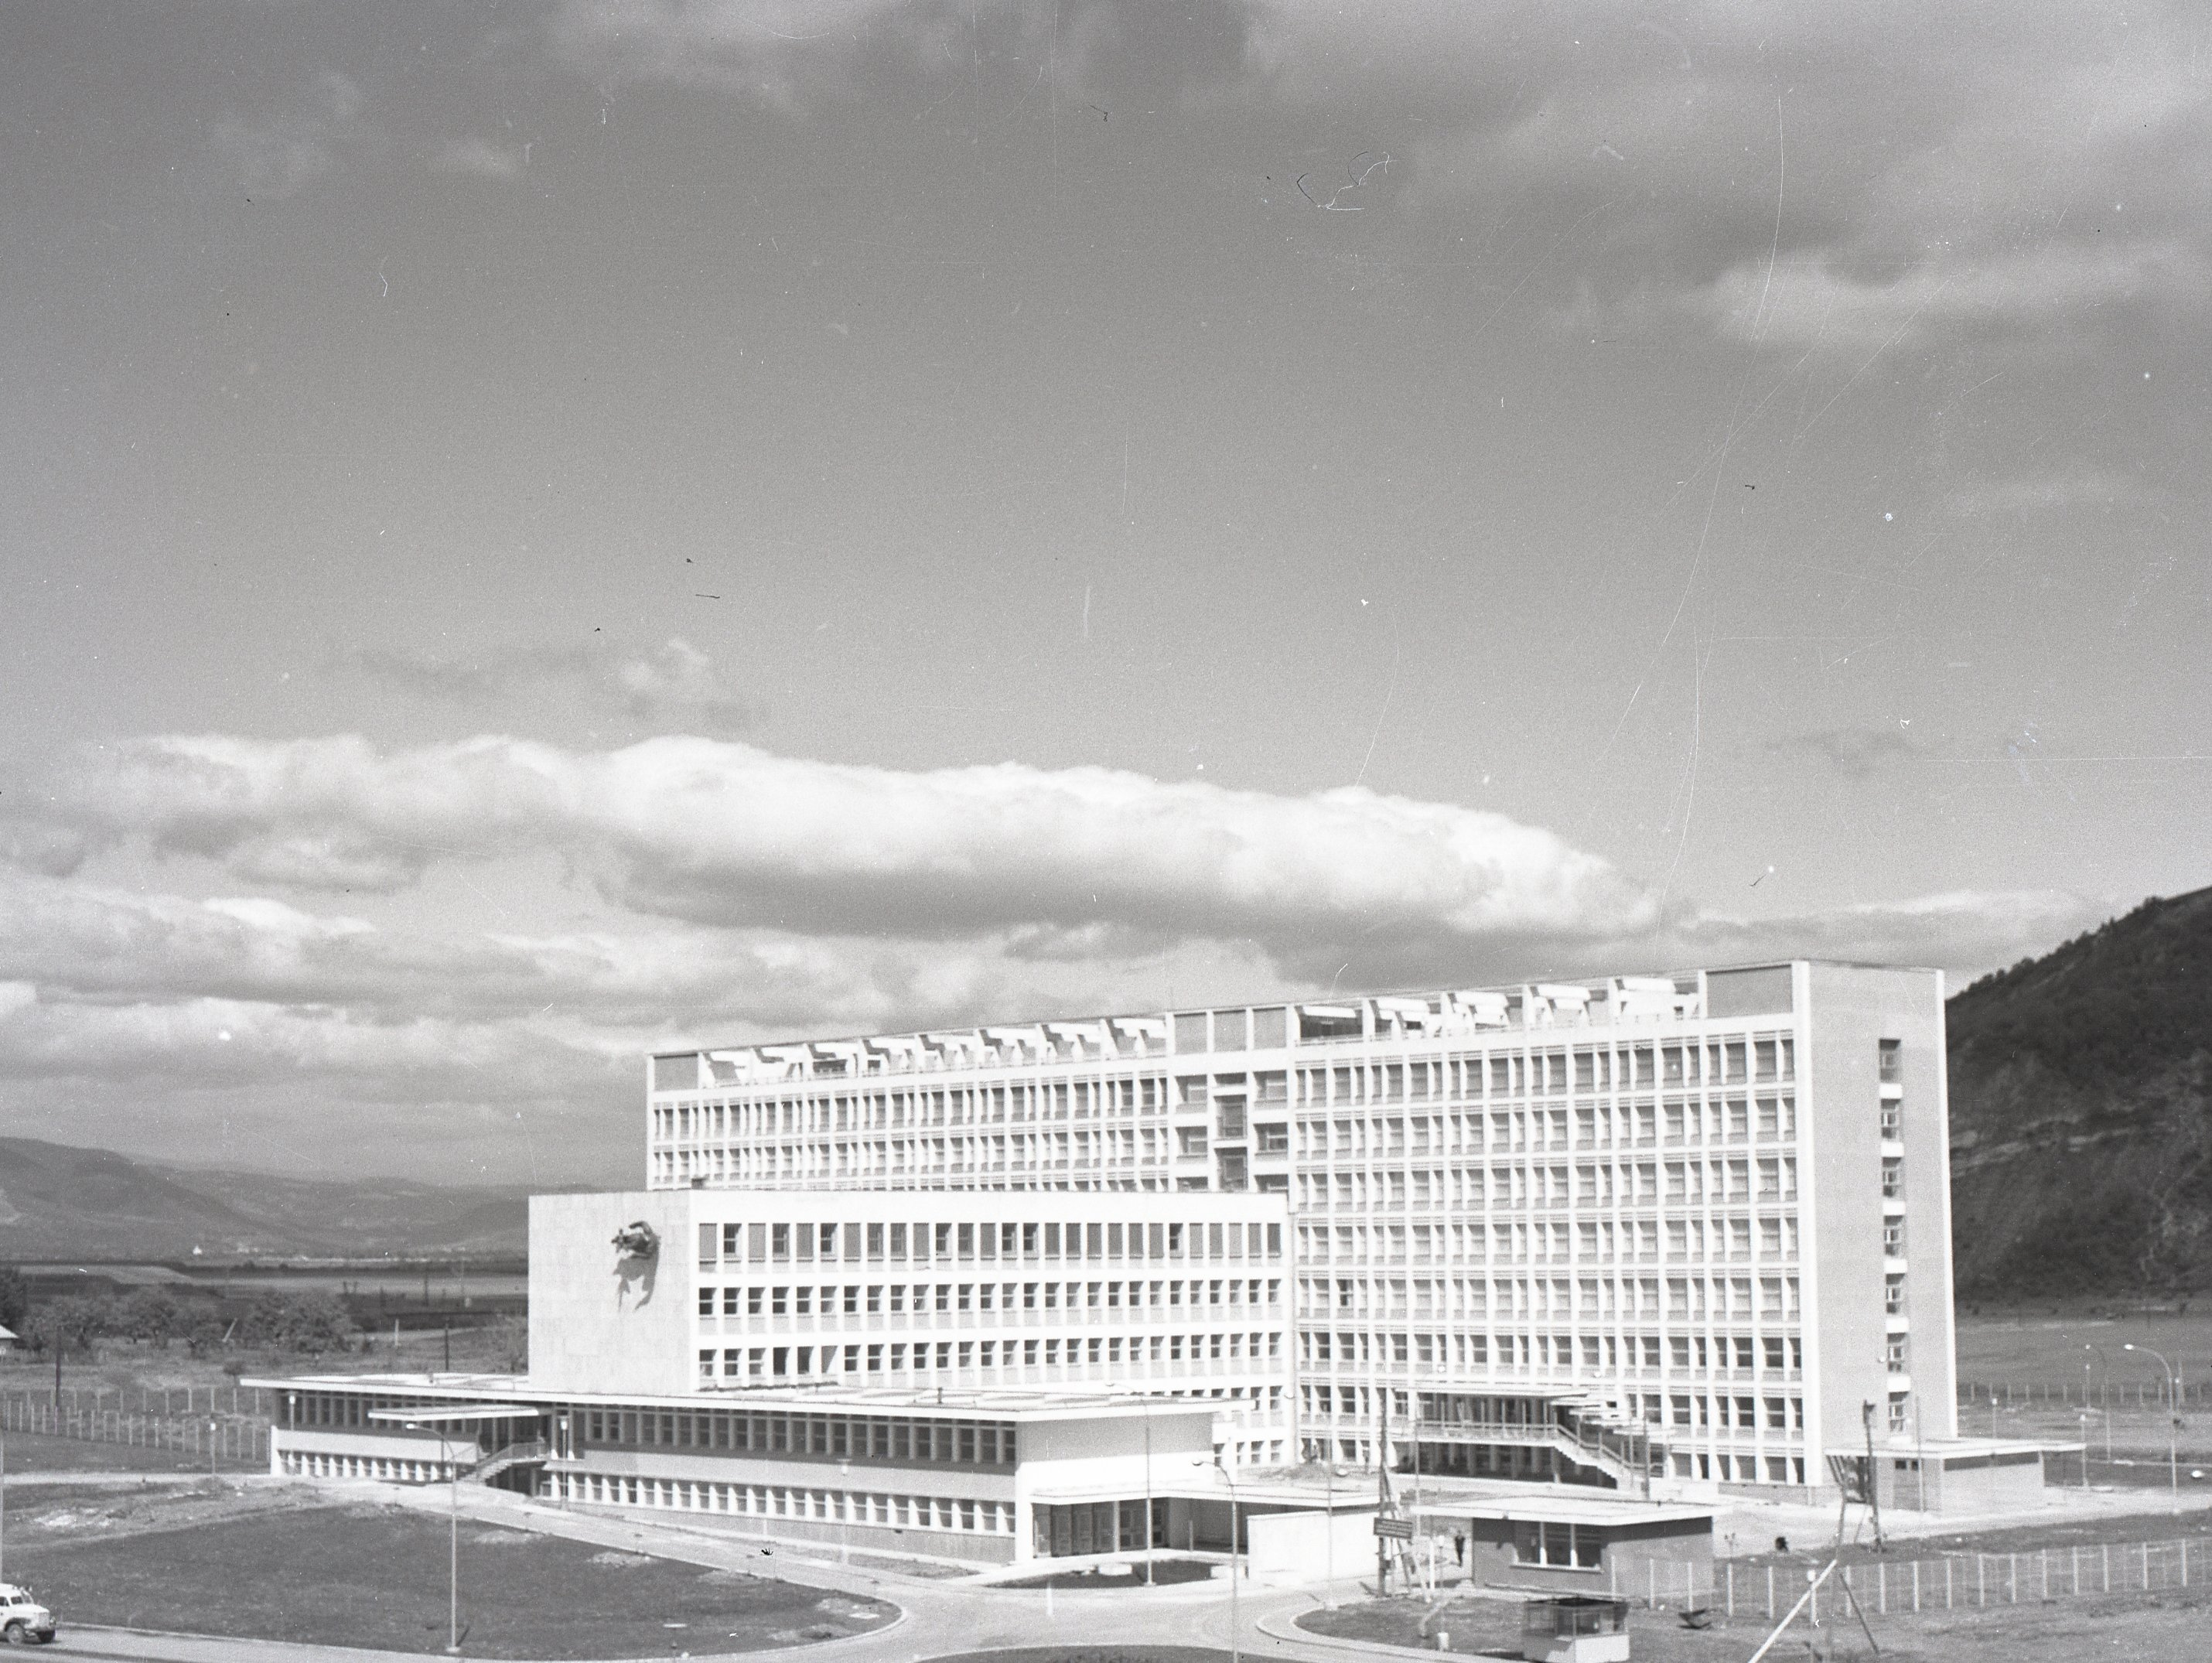 spital pentru vedere)